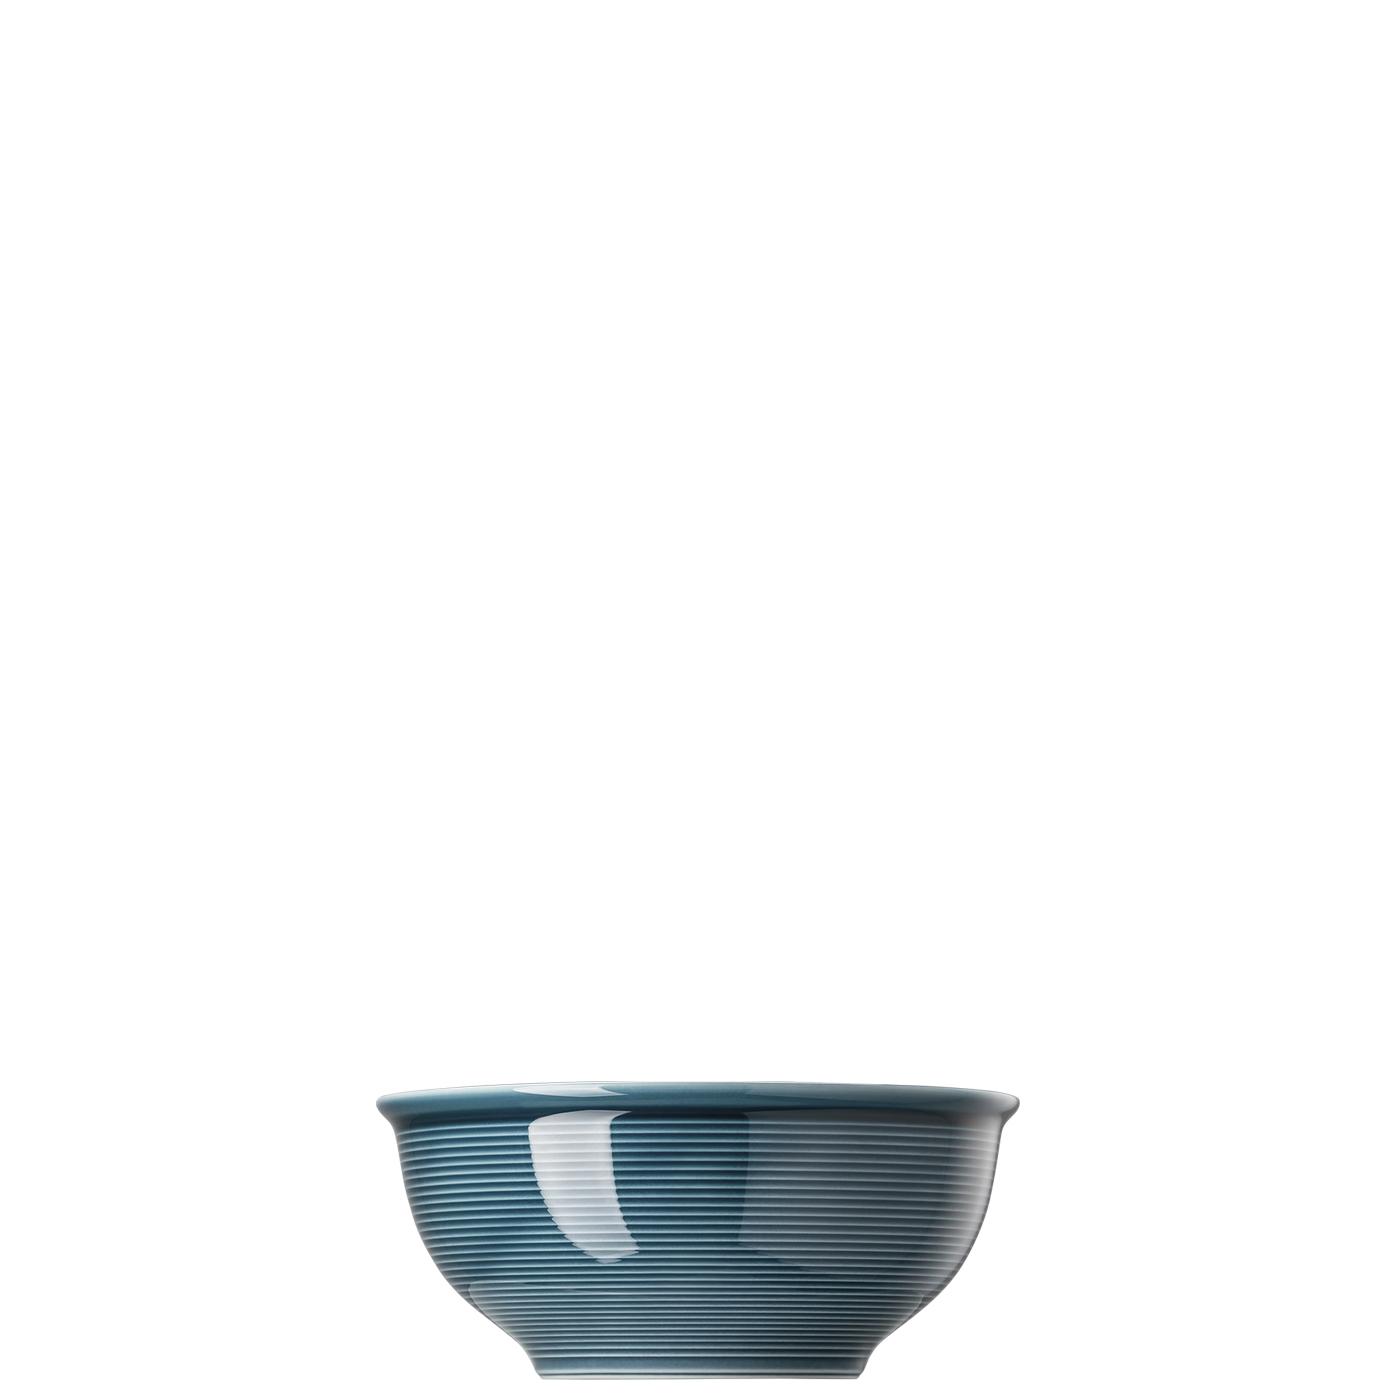 Müslischale 16 cm Trend Colour Night Blue Thomas Porzellan